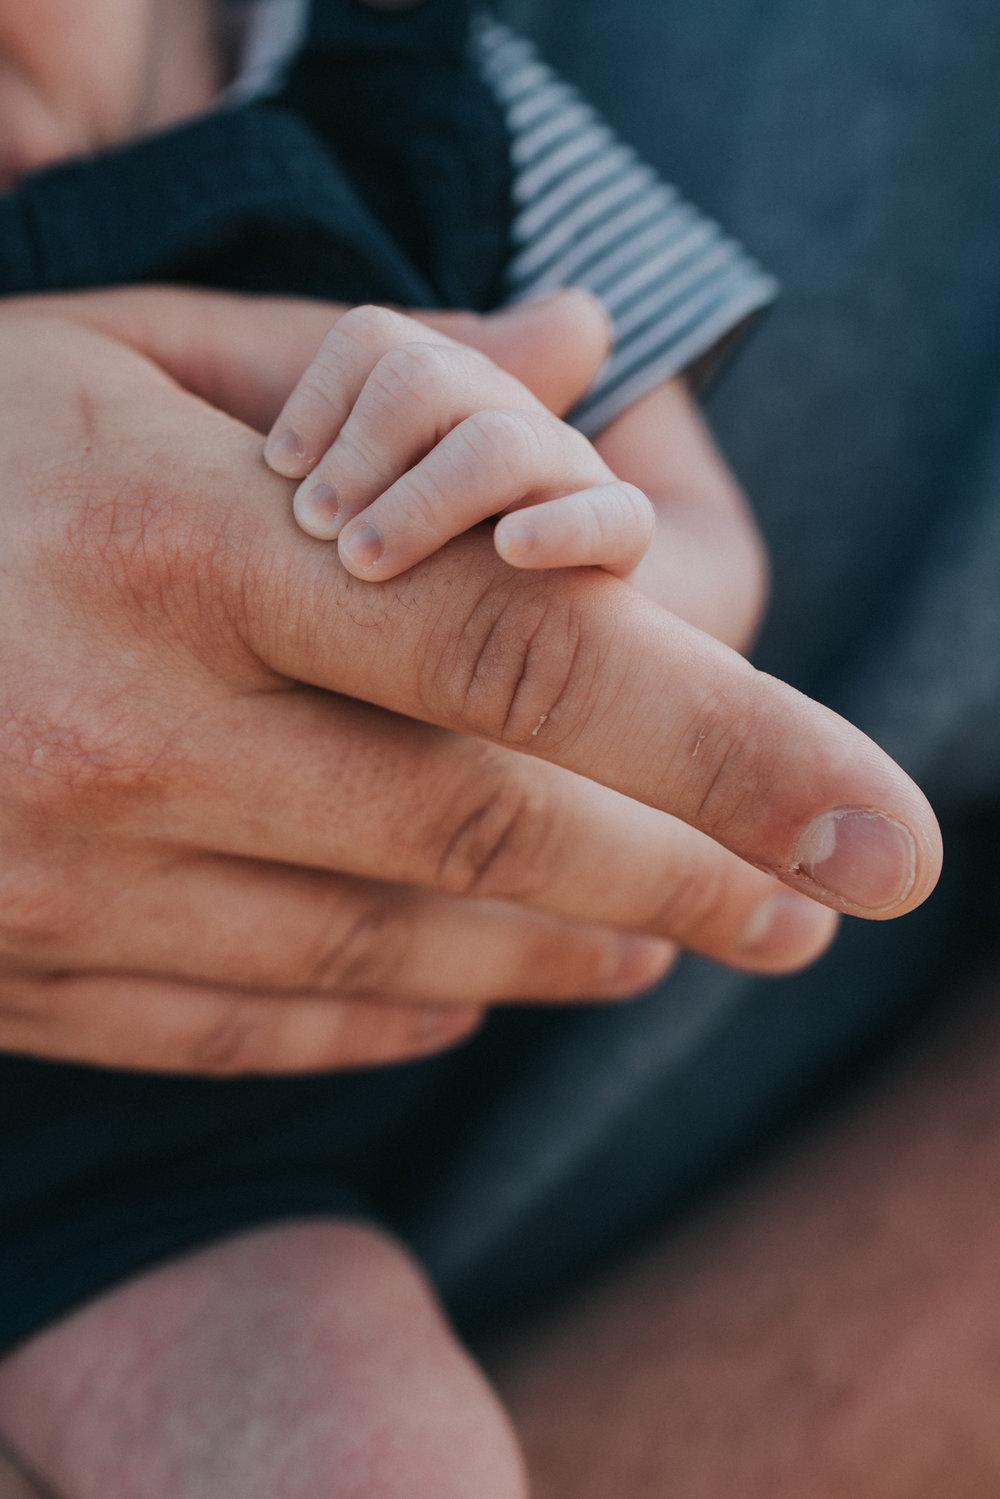 Newborn-Baby-Cooper-Grace-Elizabeth-Alternative-Wedding-Photographer-Colchester-Essex-Mersea-Island-34.jpg